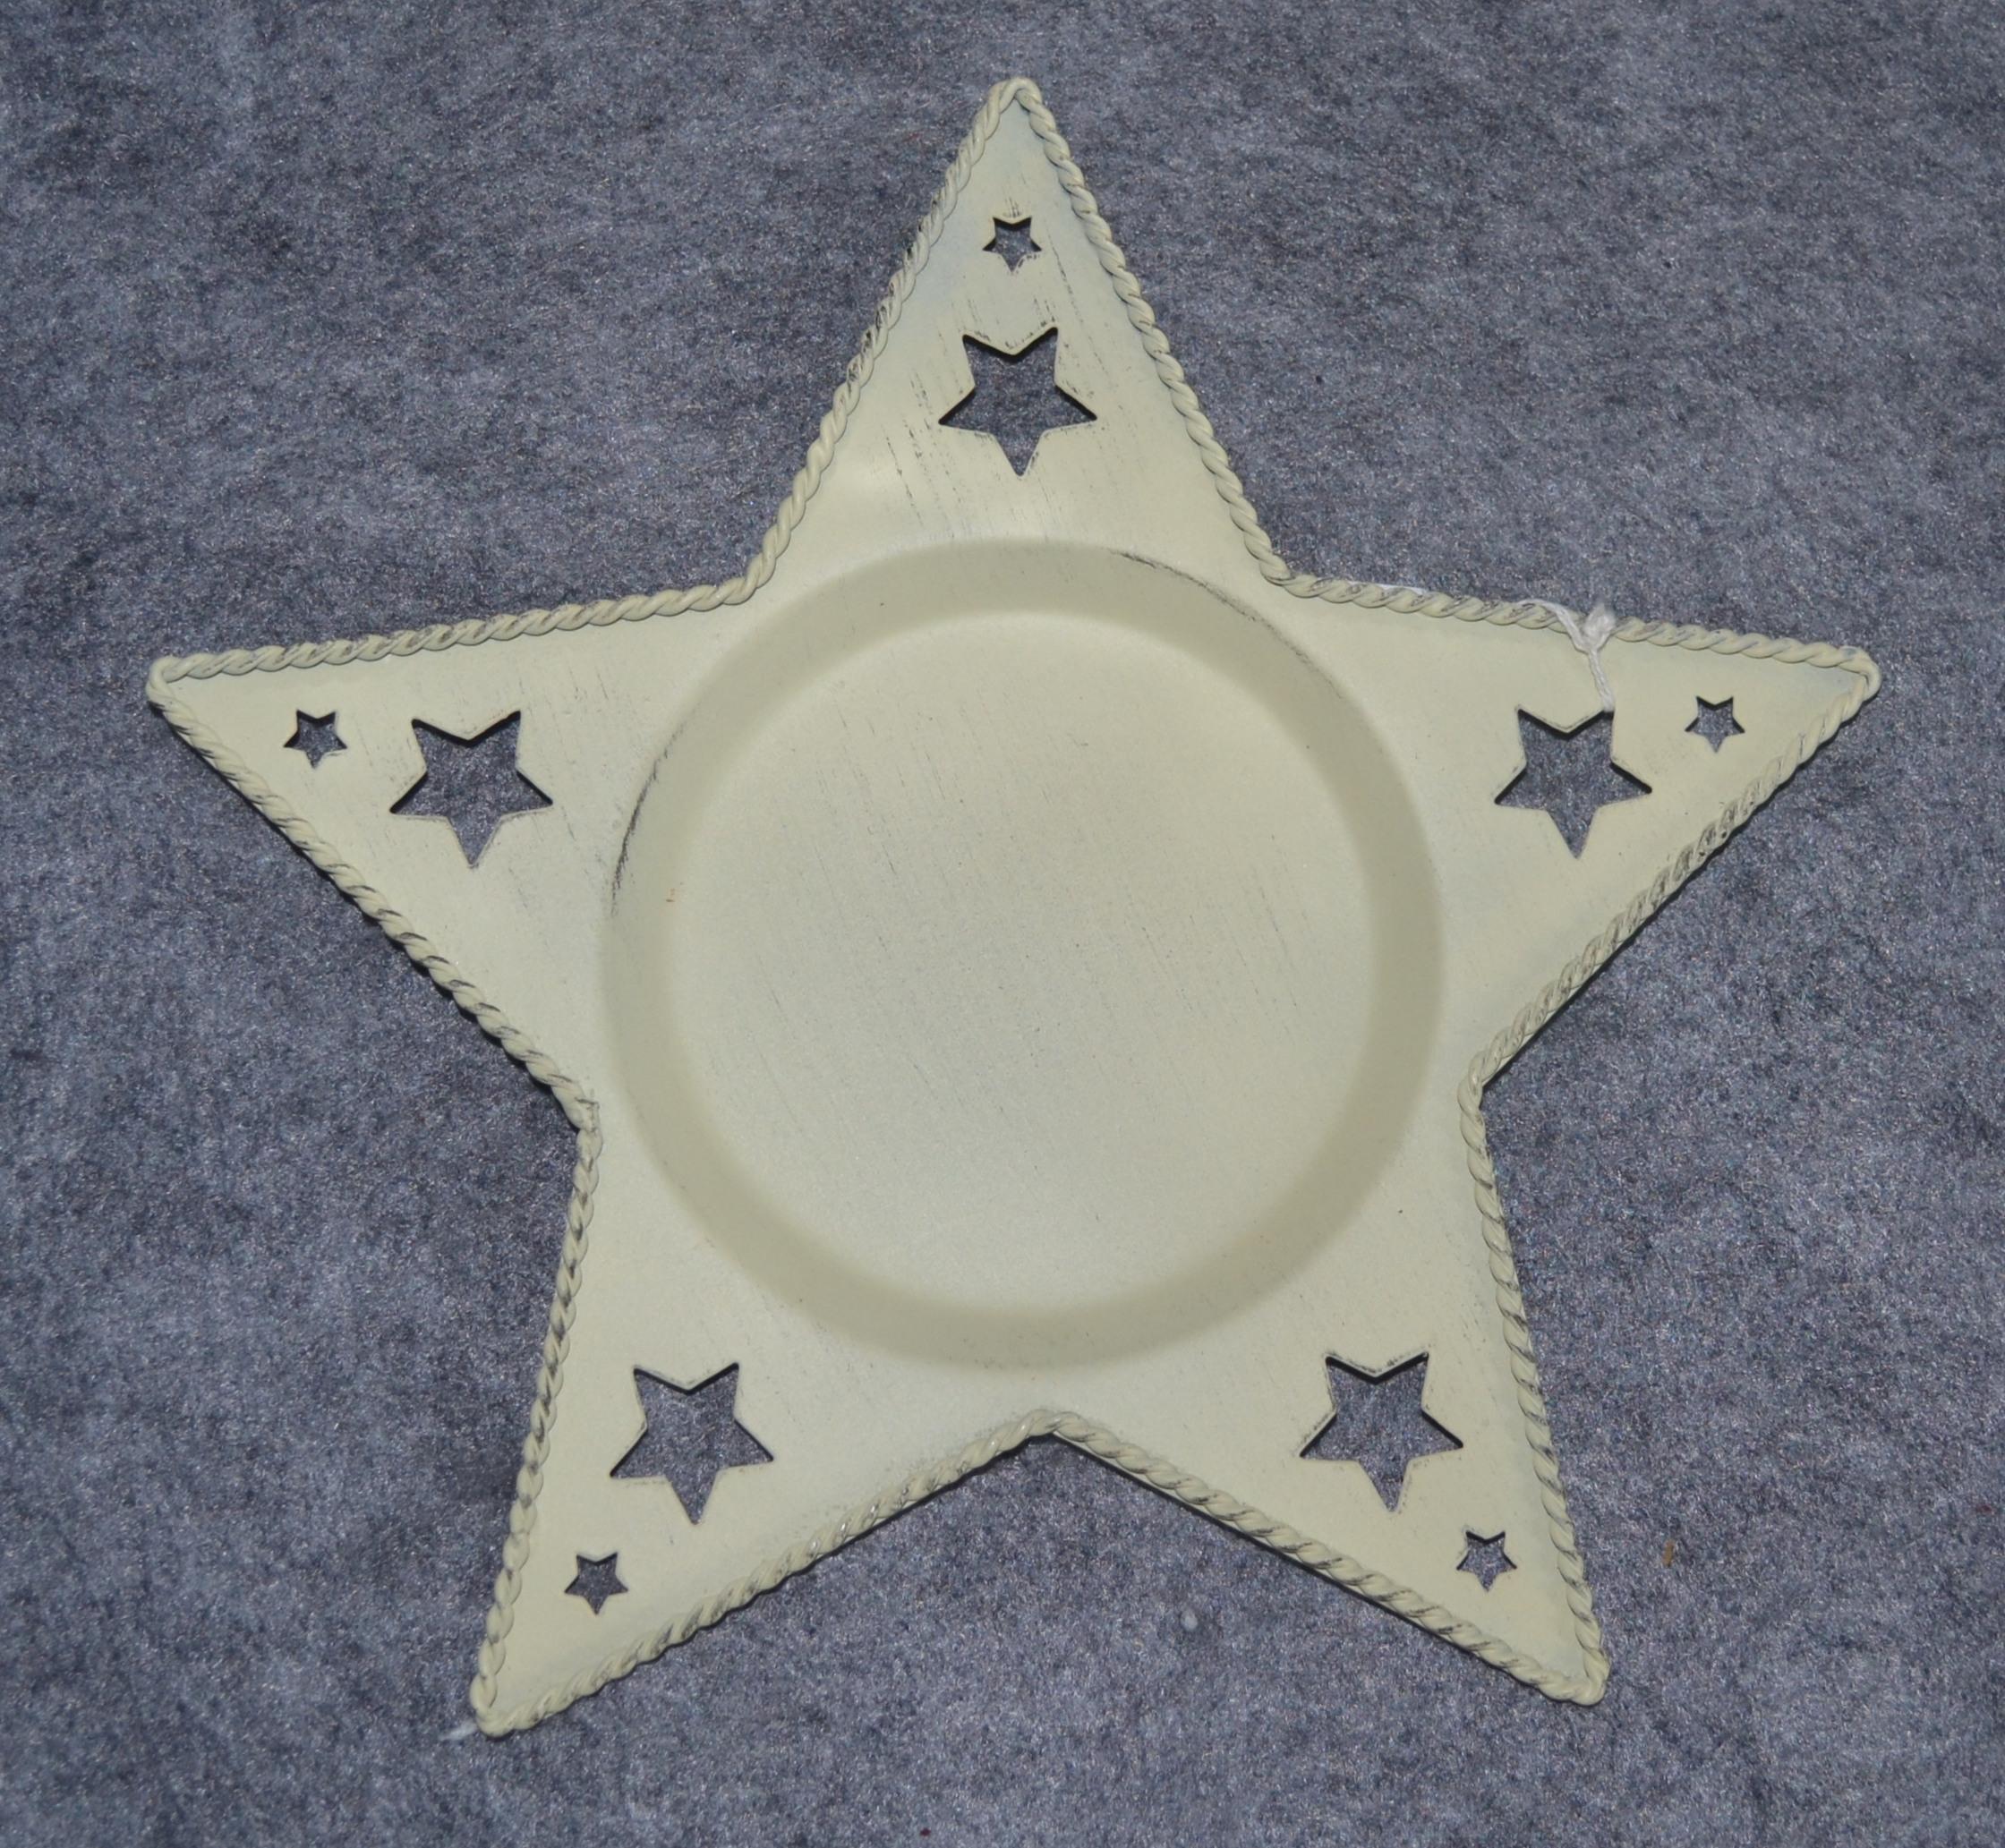 metal-star-plare-9-inch-8910.jpg